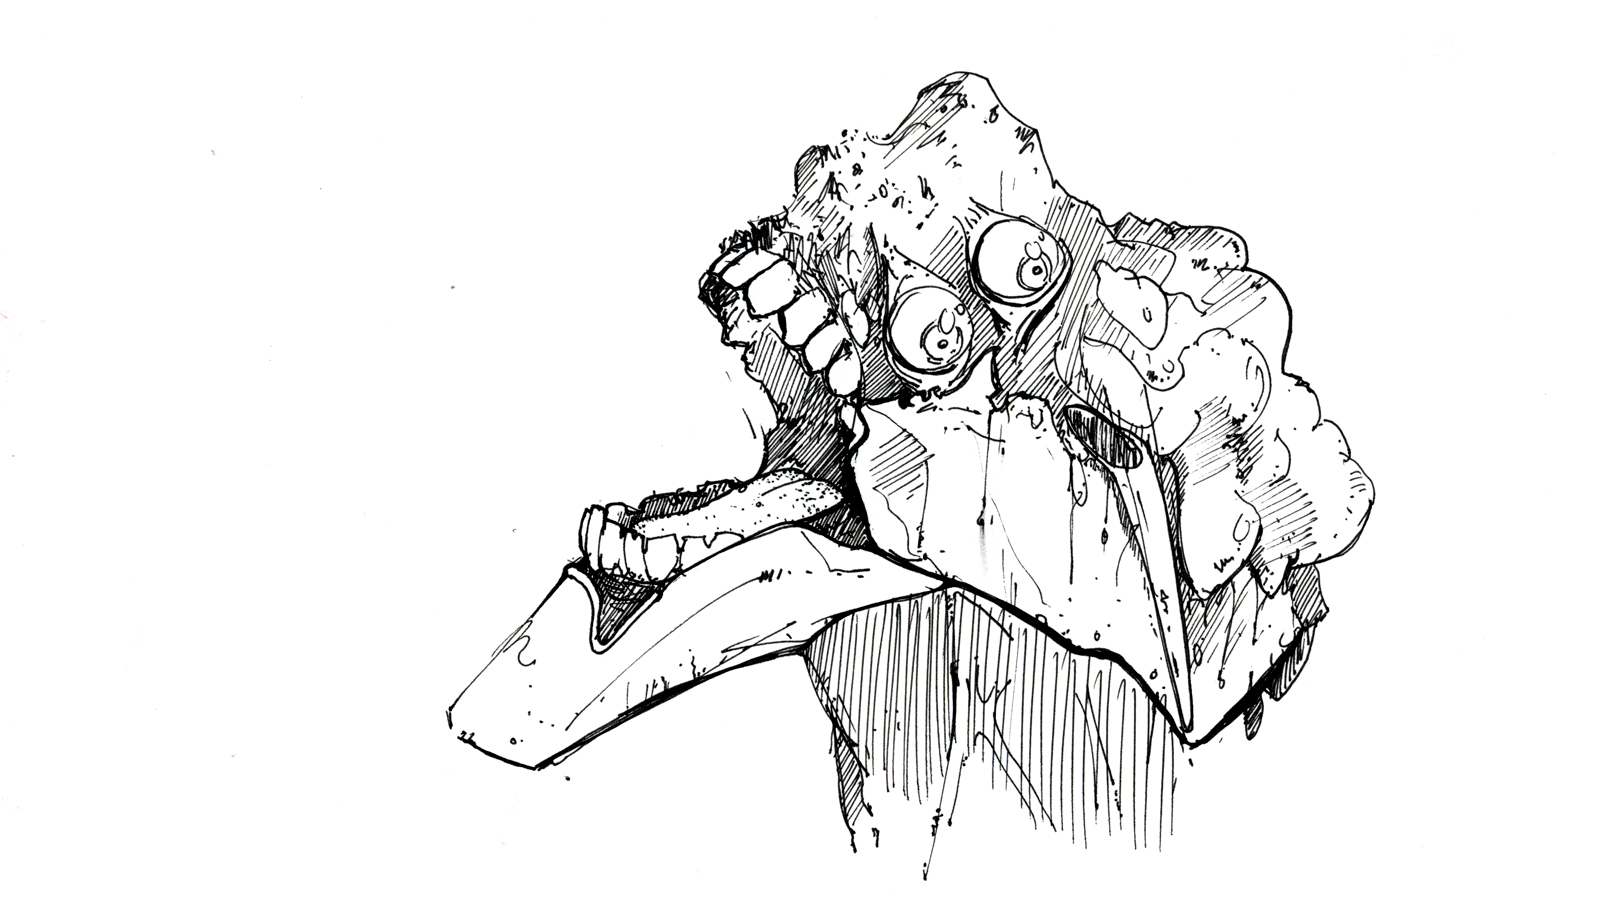 sketch-eva_david-jackowski_alvatron-studio.jpg